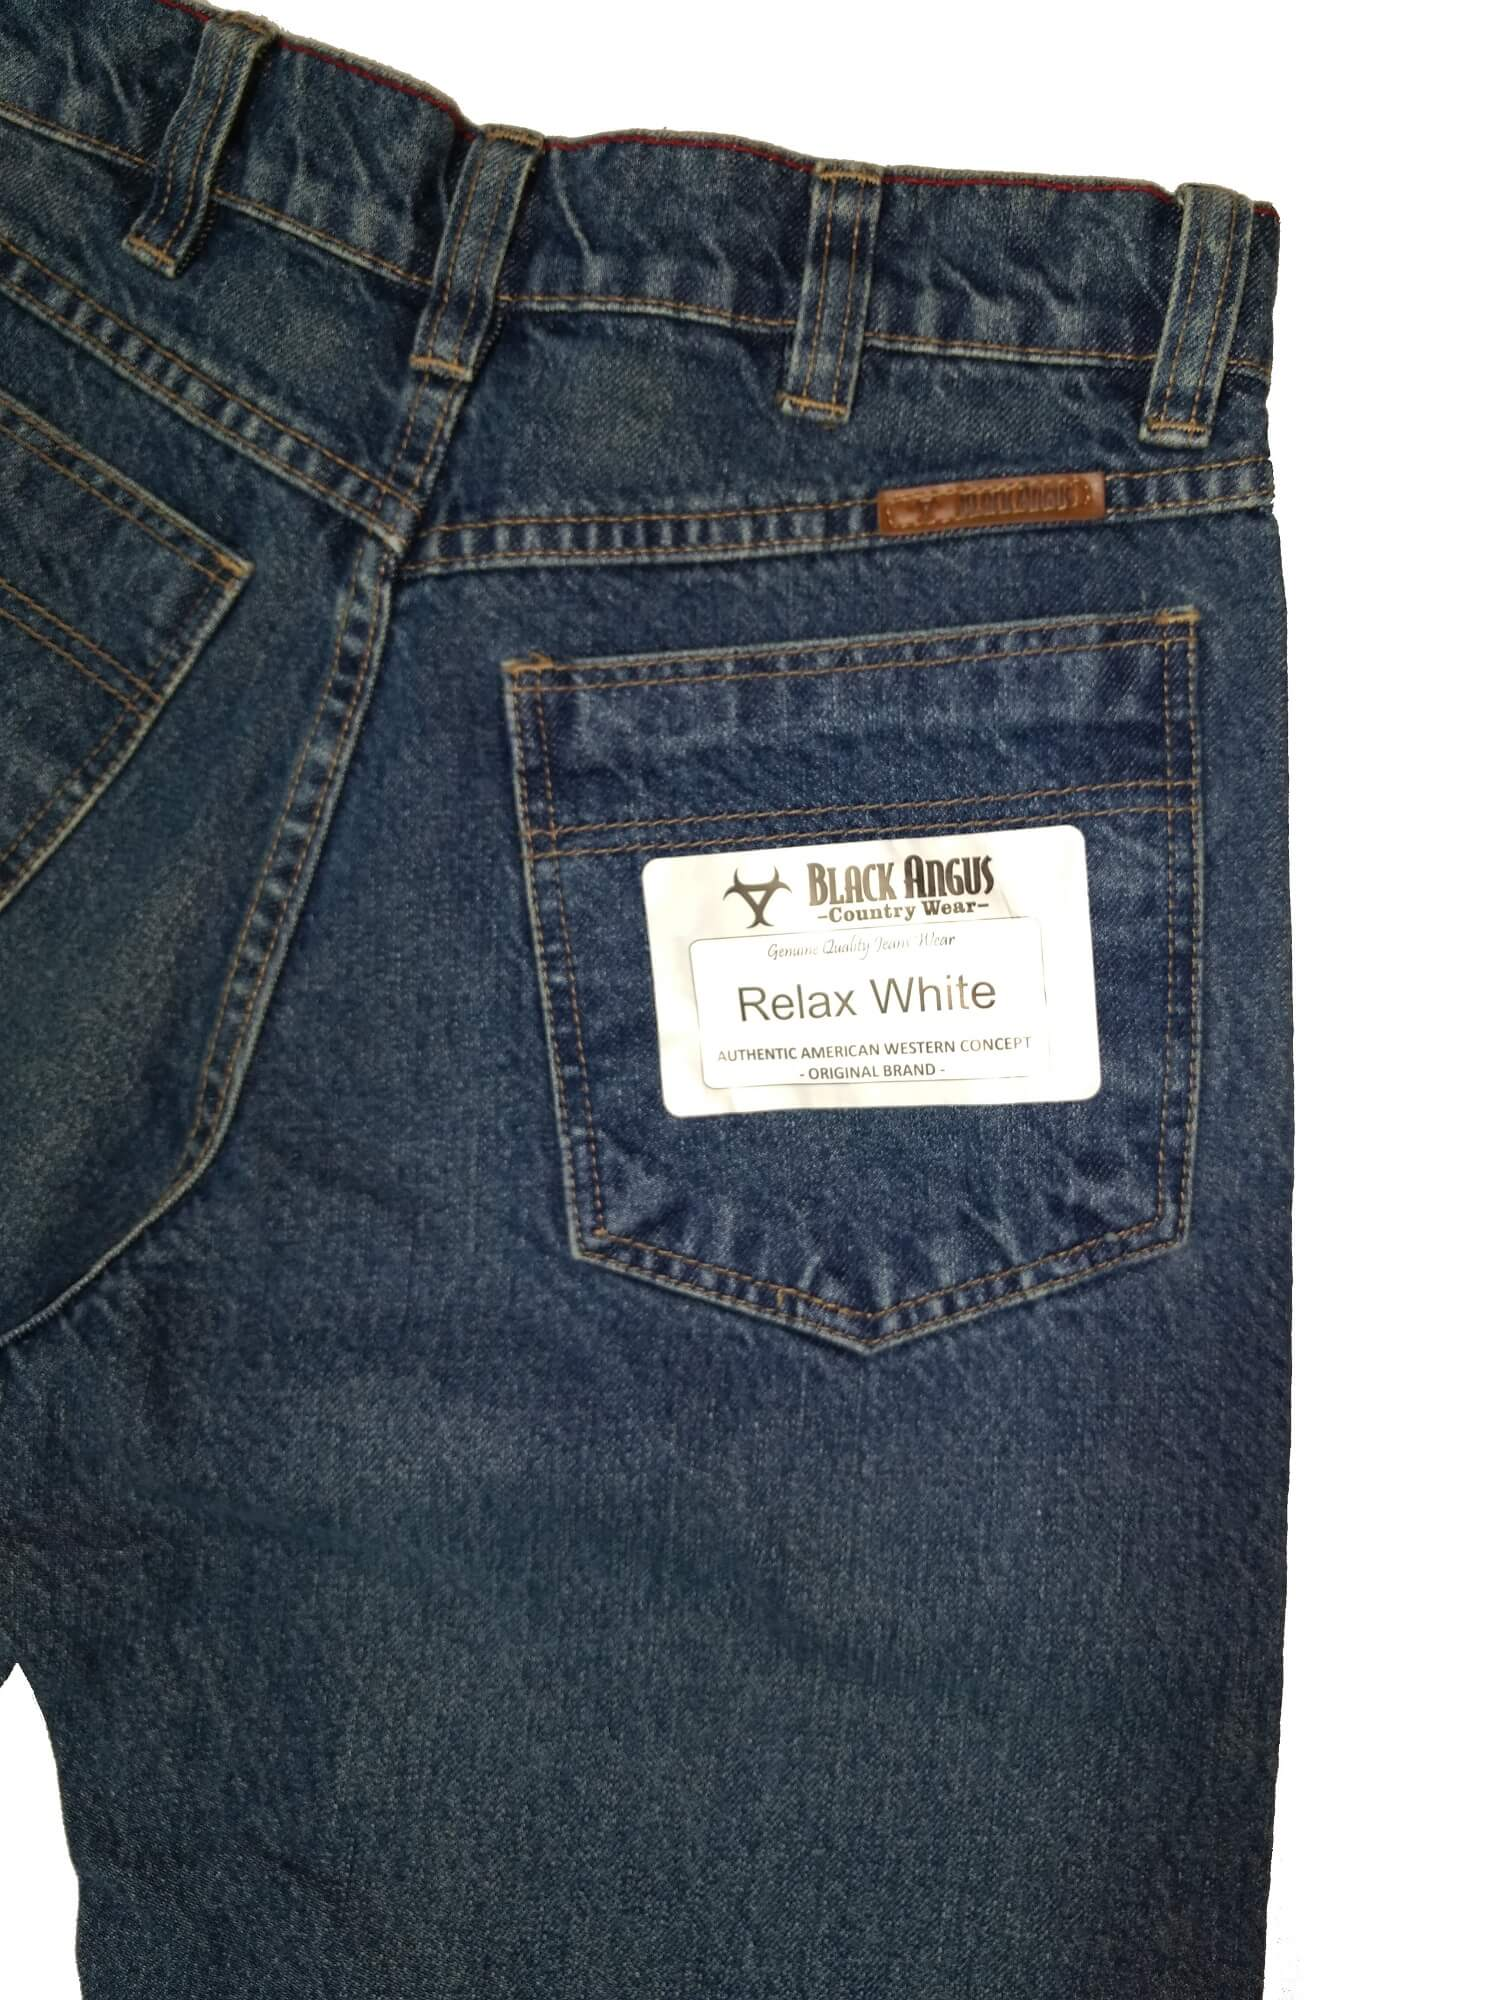 Calça Masculina Black Angus White Ref. 050018